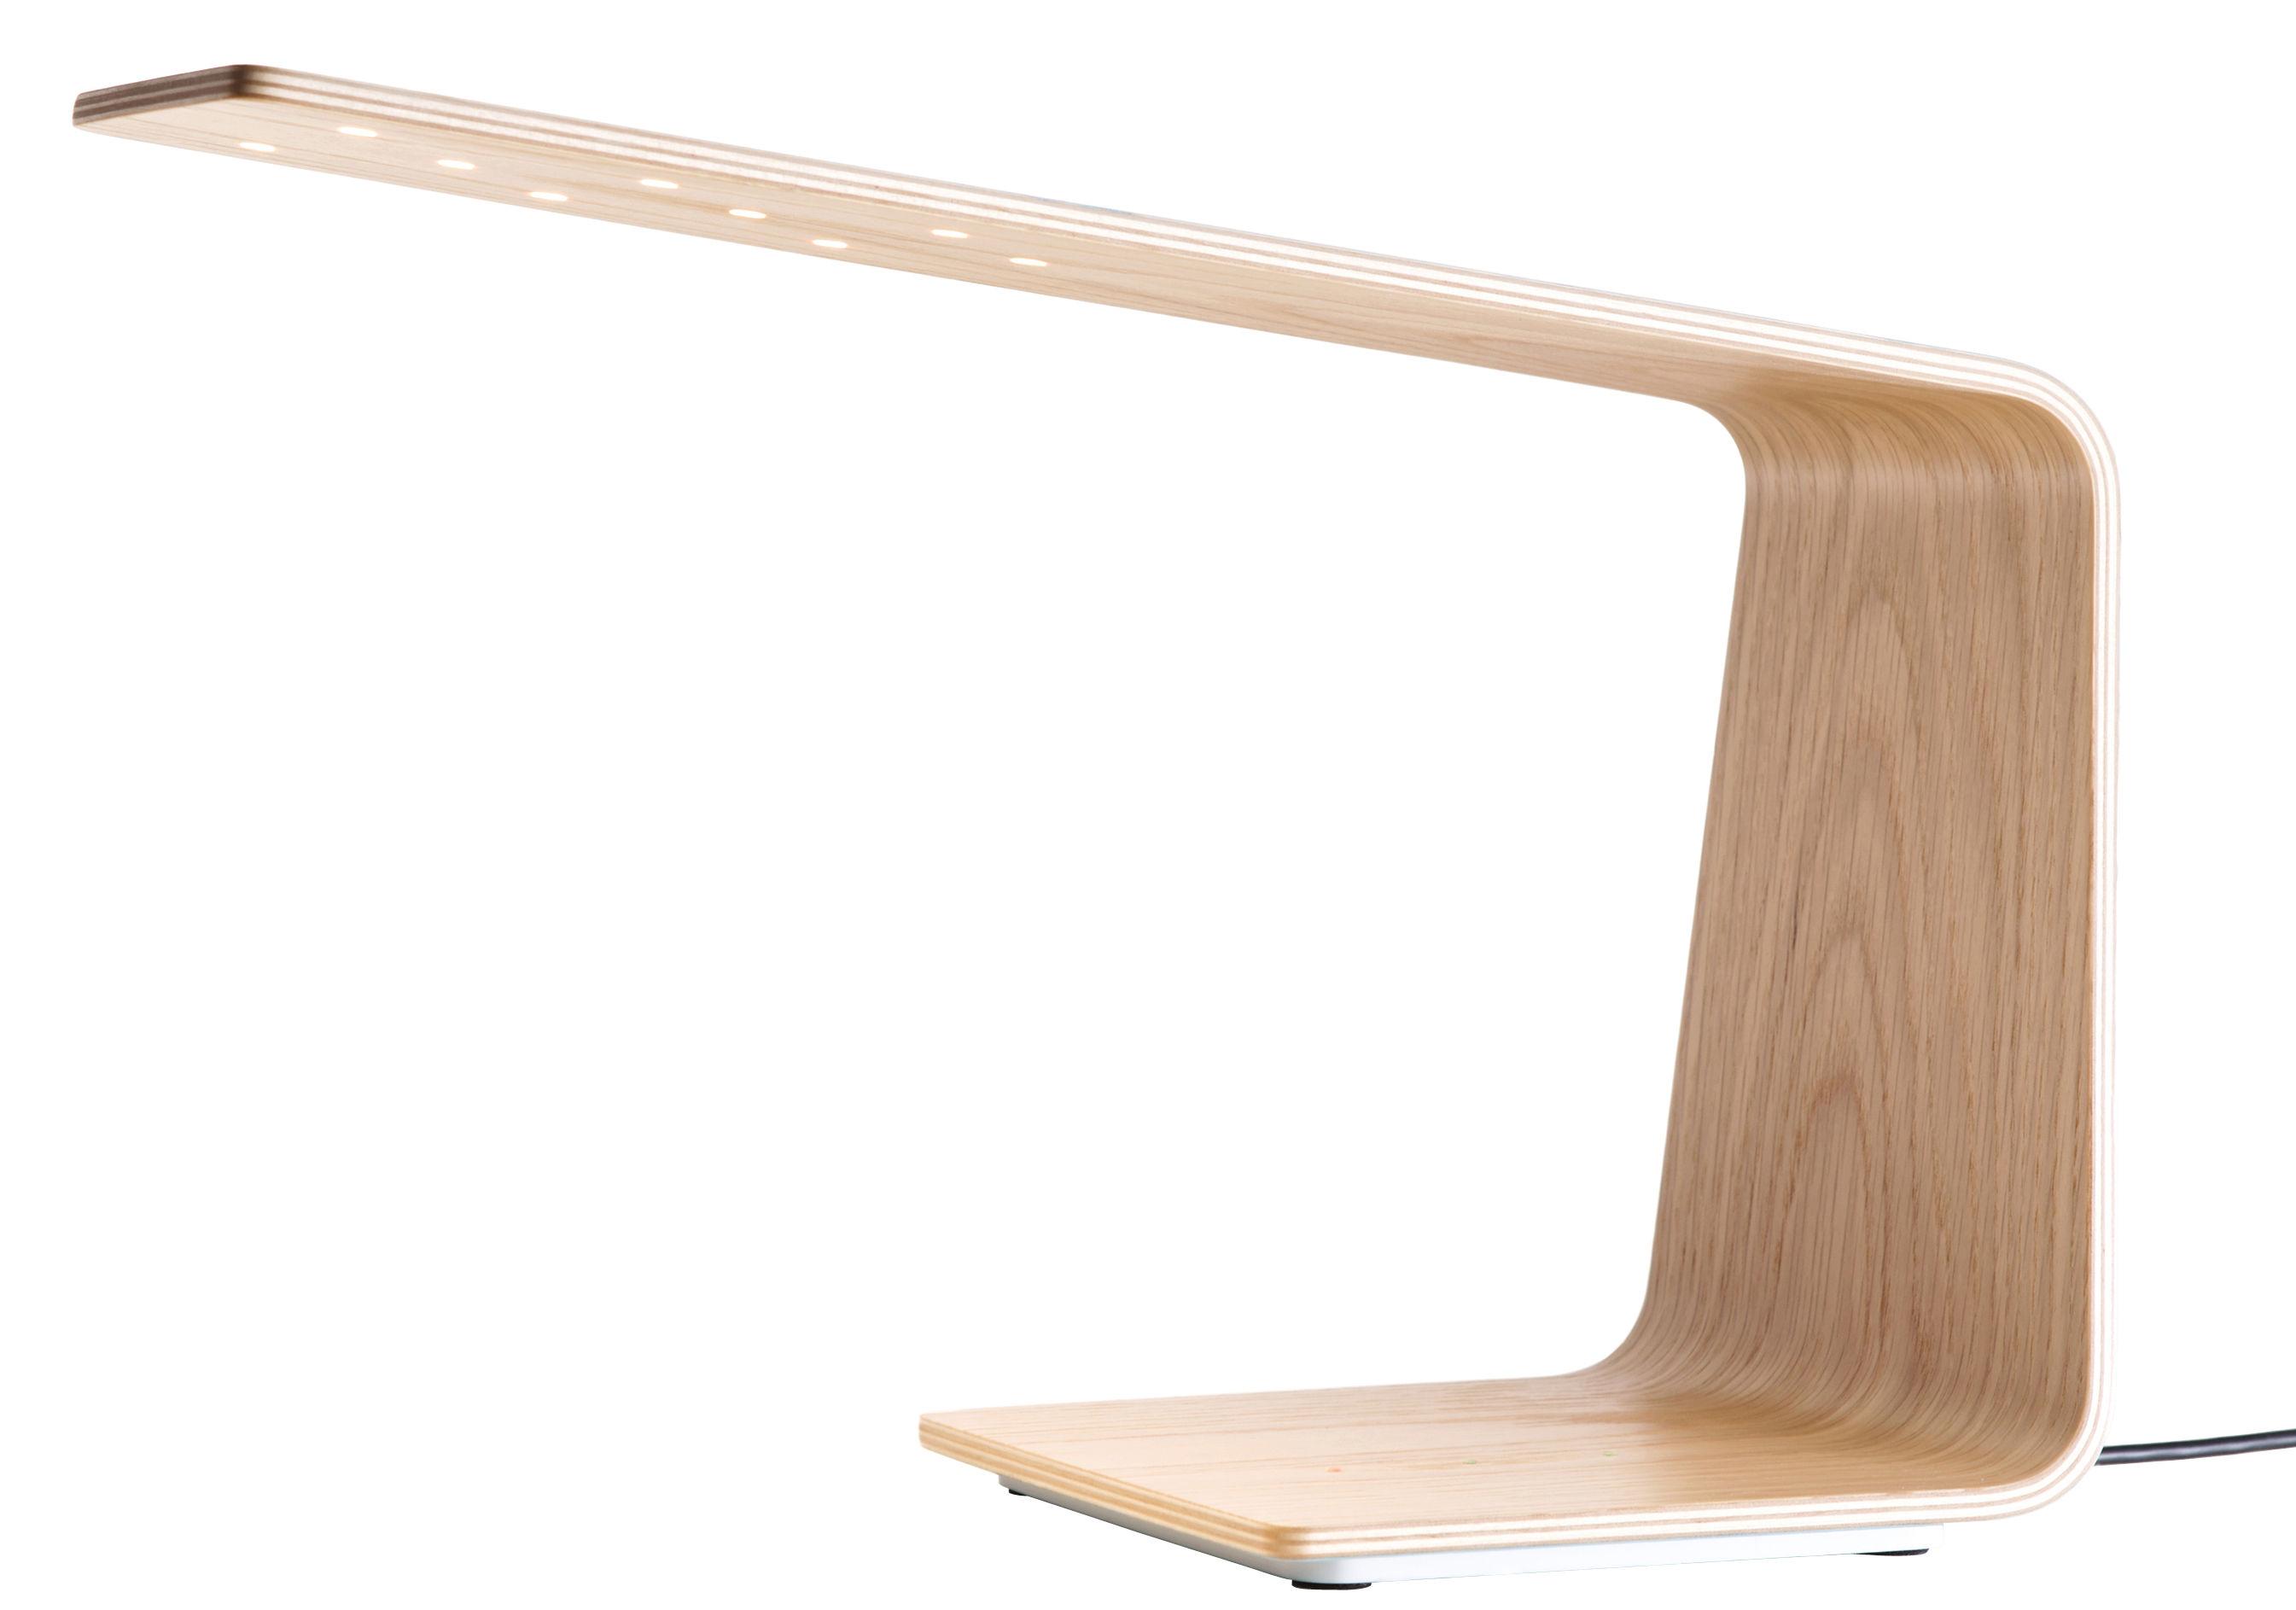 Luminaire - Lampes de table - Lampe de table LED1 / H 30 cm - Tunto - Chêne - Chêne